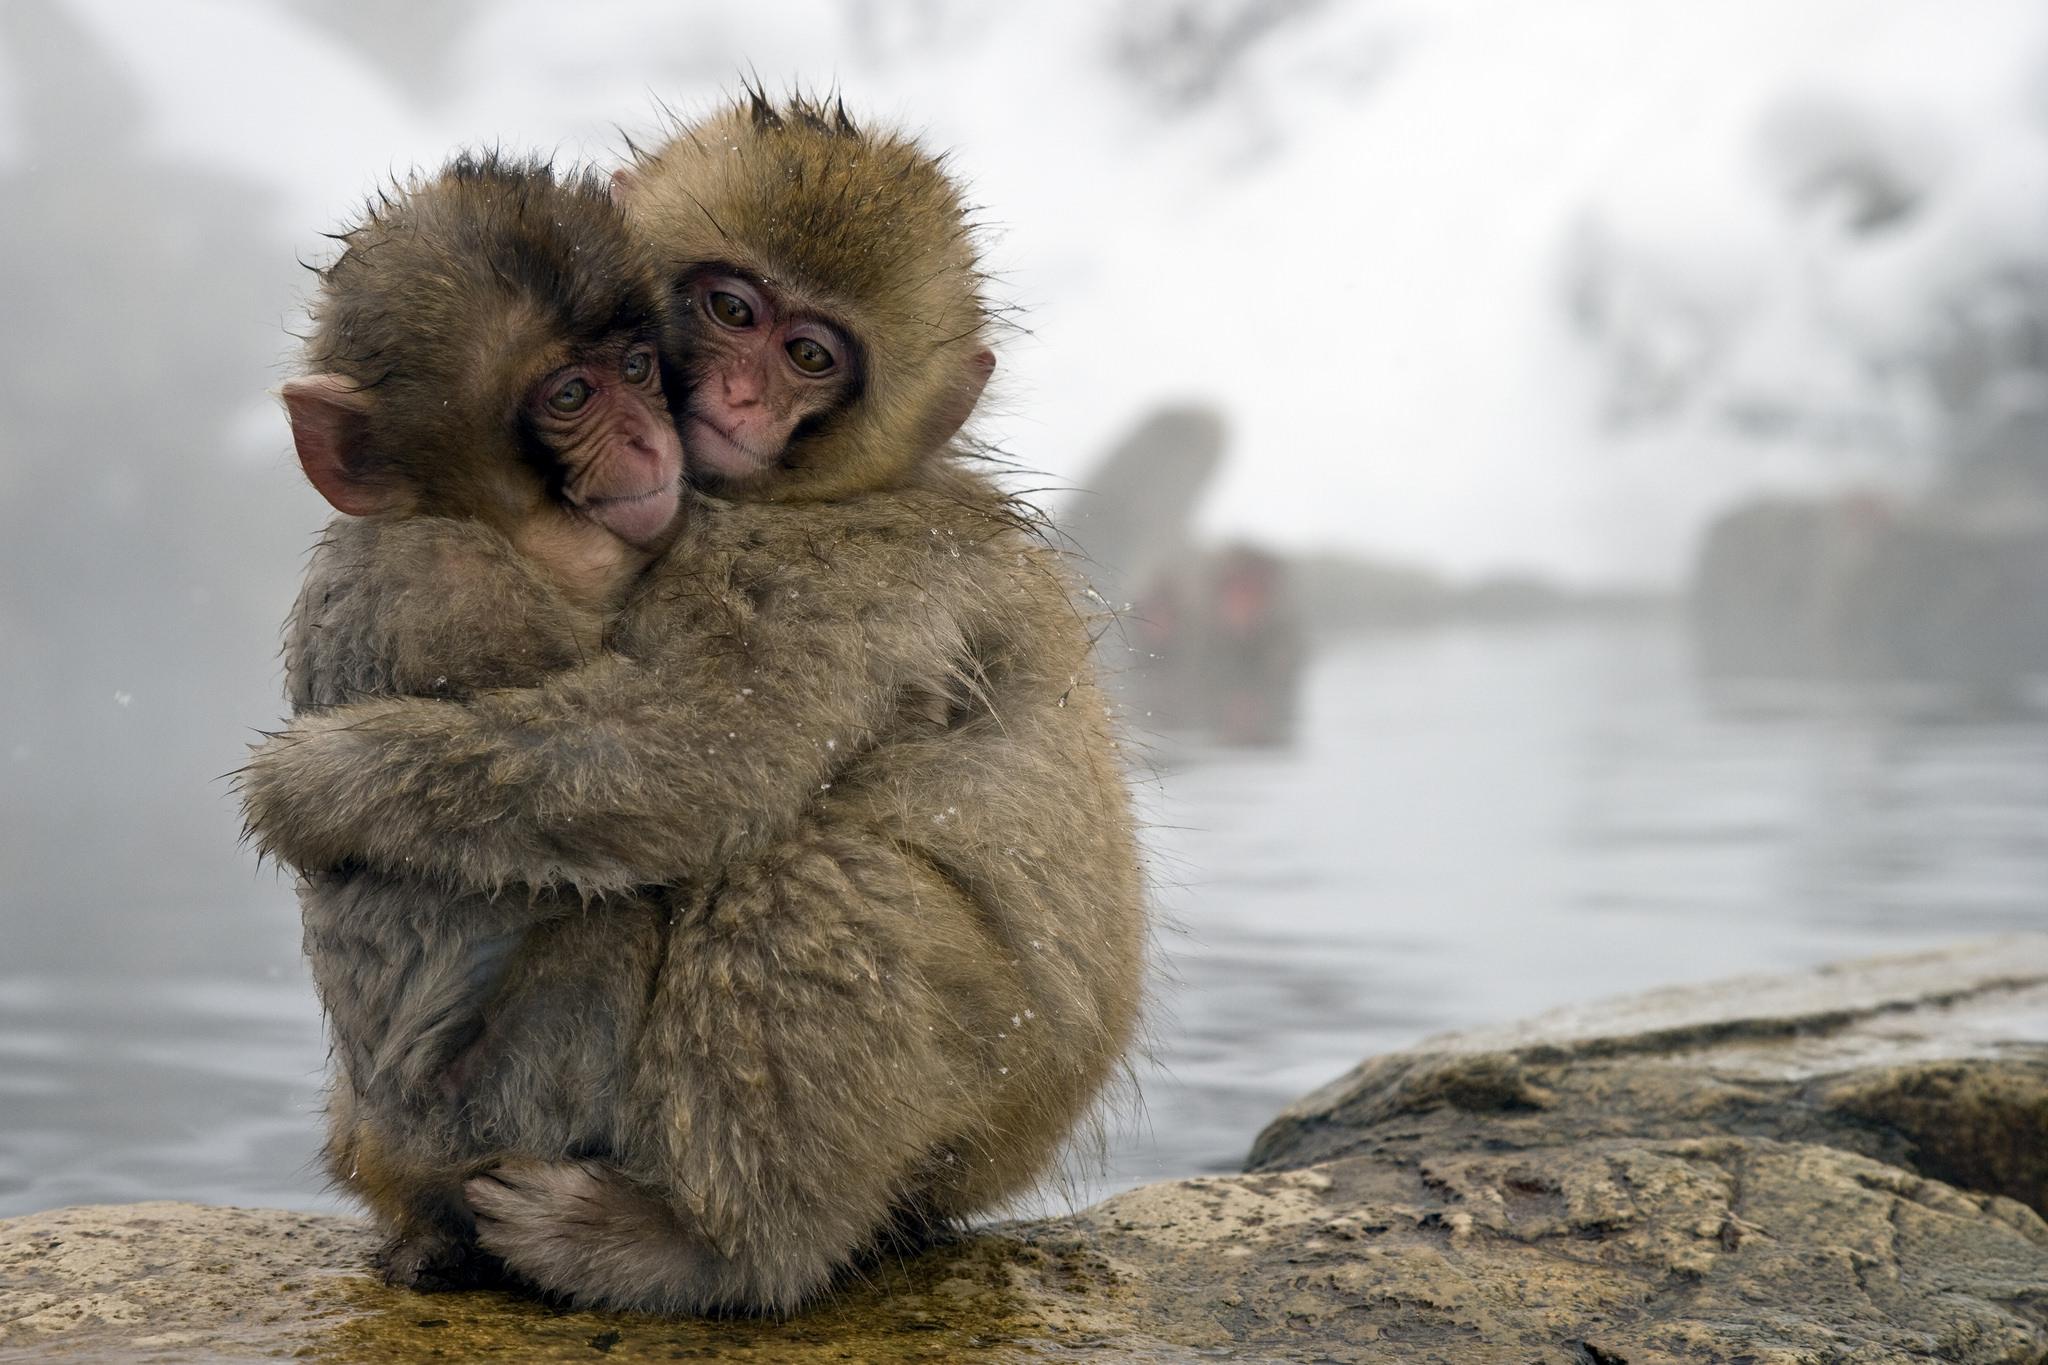 Japan's snow monkeys